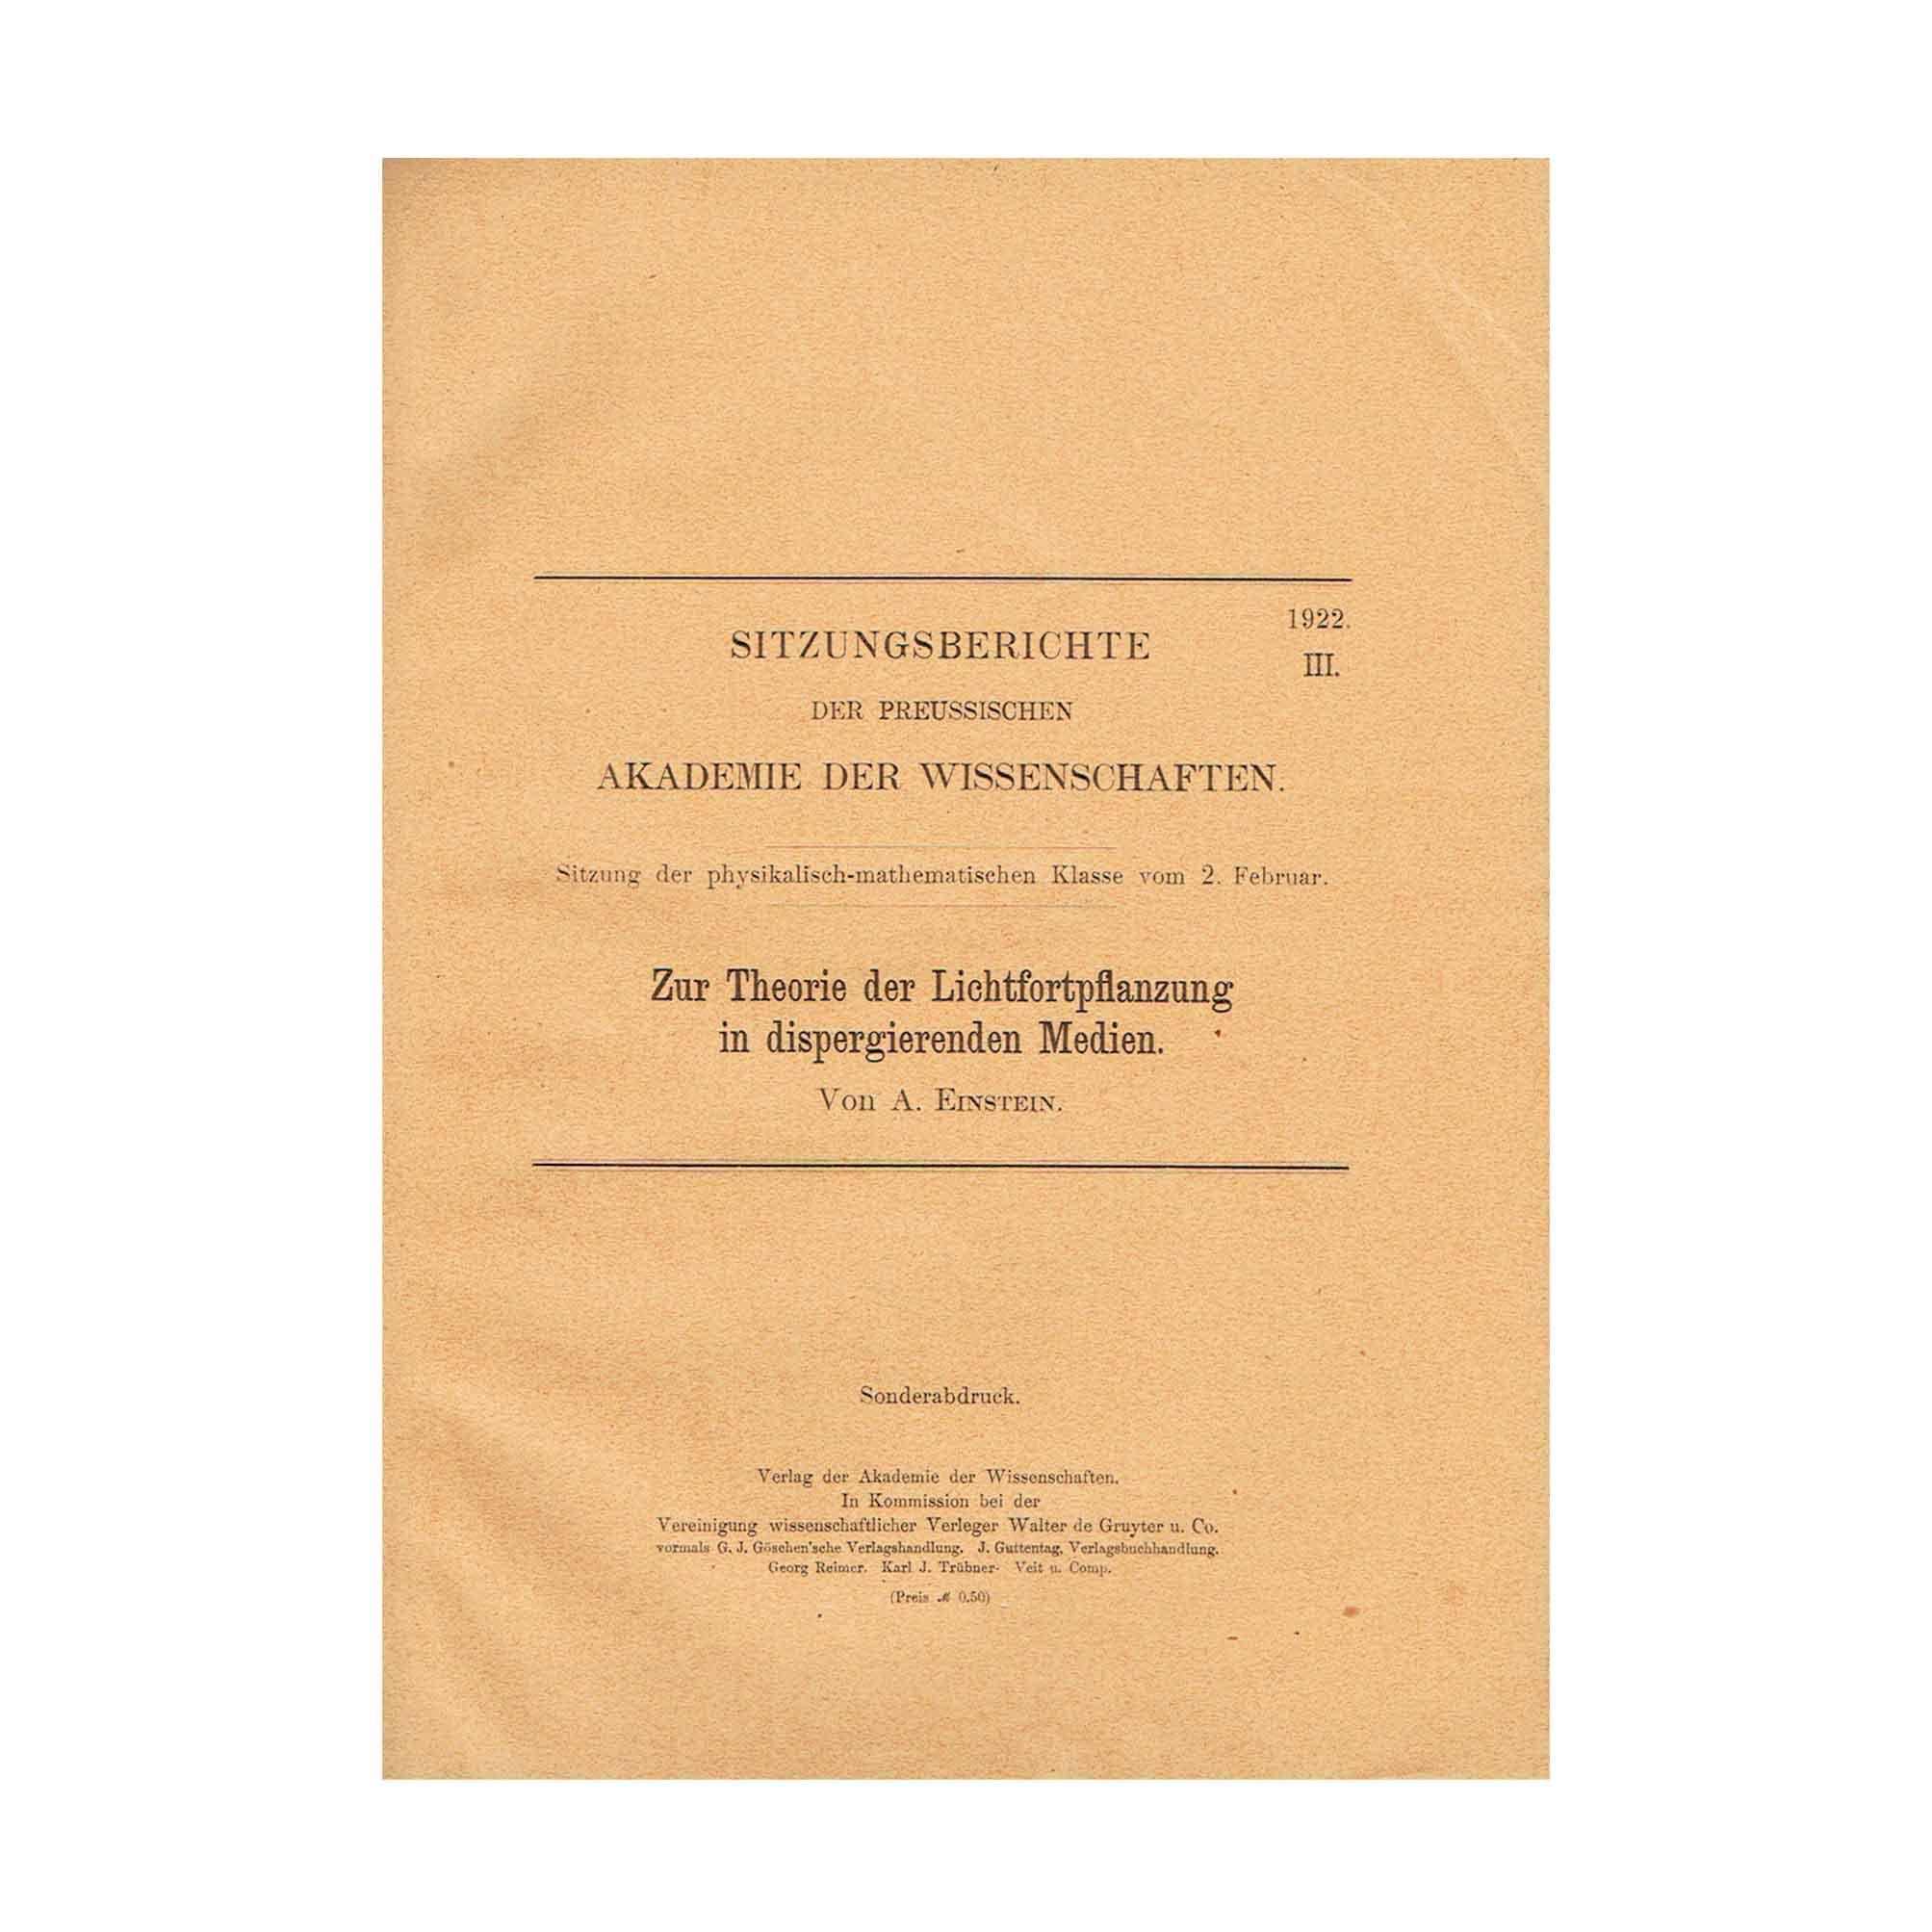 5728-Einstein-Propagation-of-Light-Akademie-III-1922-SA-Cover-recto-N.jpeg